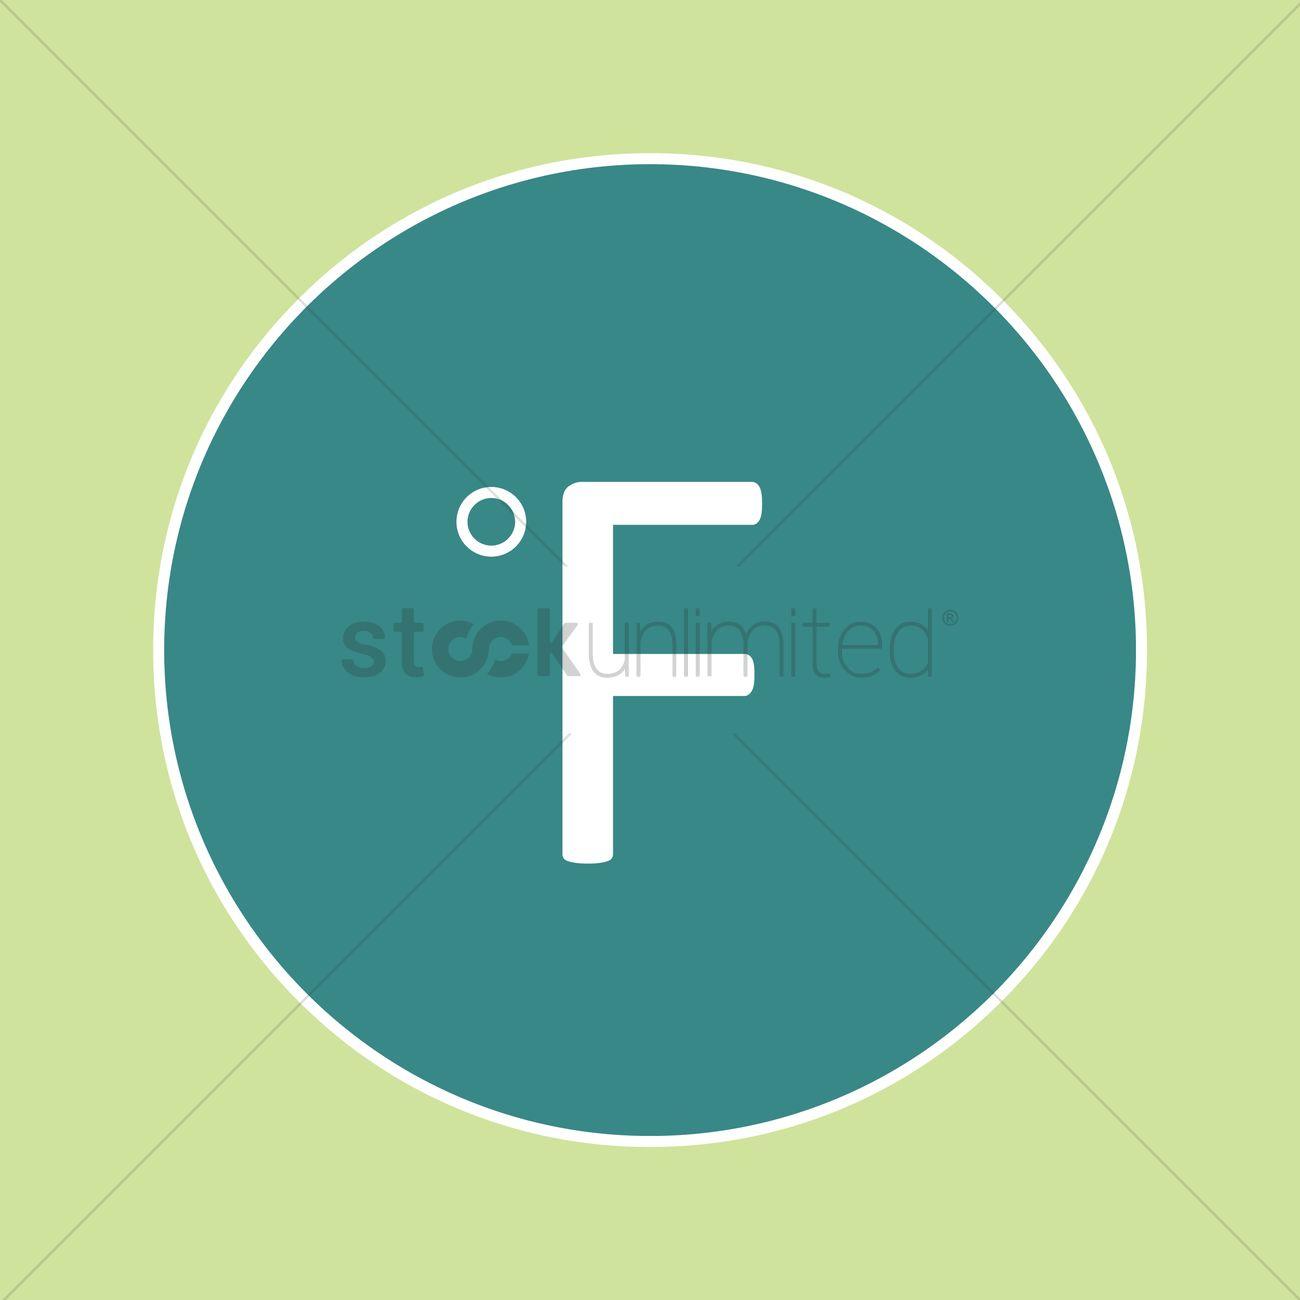 Fahrenheit symbol icon vector image 1335062 stockunlimited fahrenheit symbol icon vector graphic biocorpaavc Choice Image